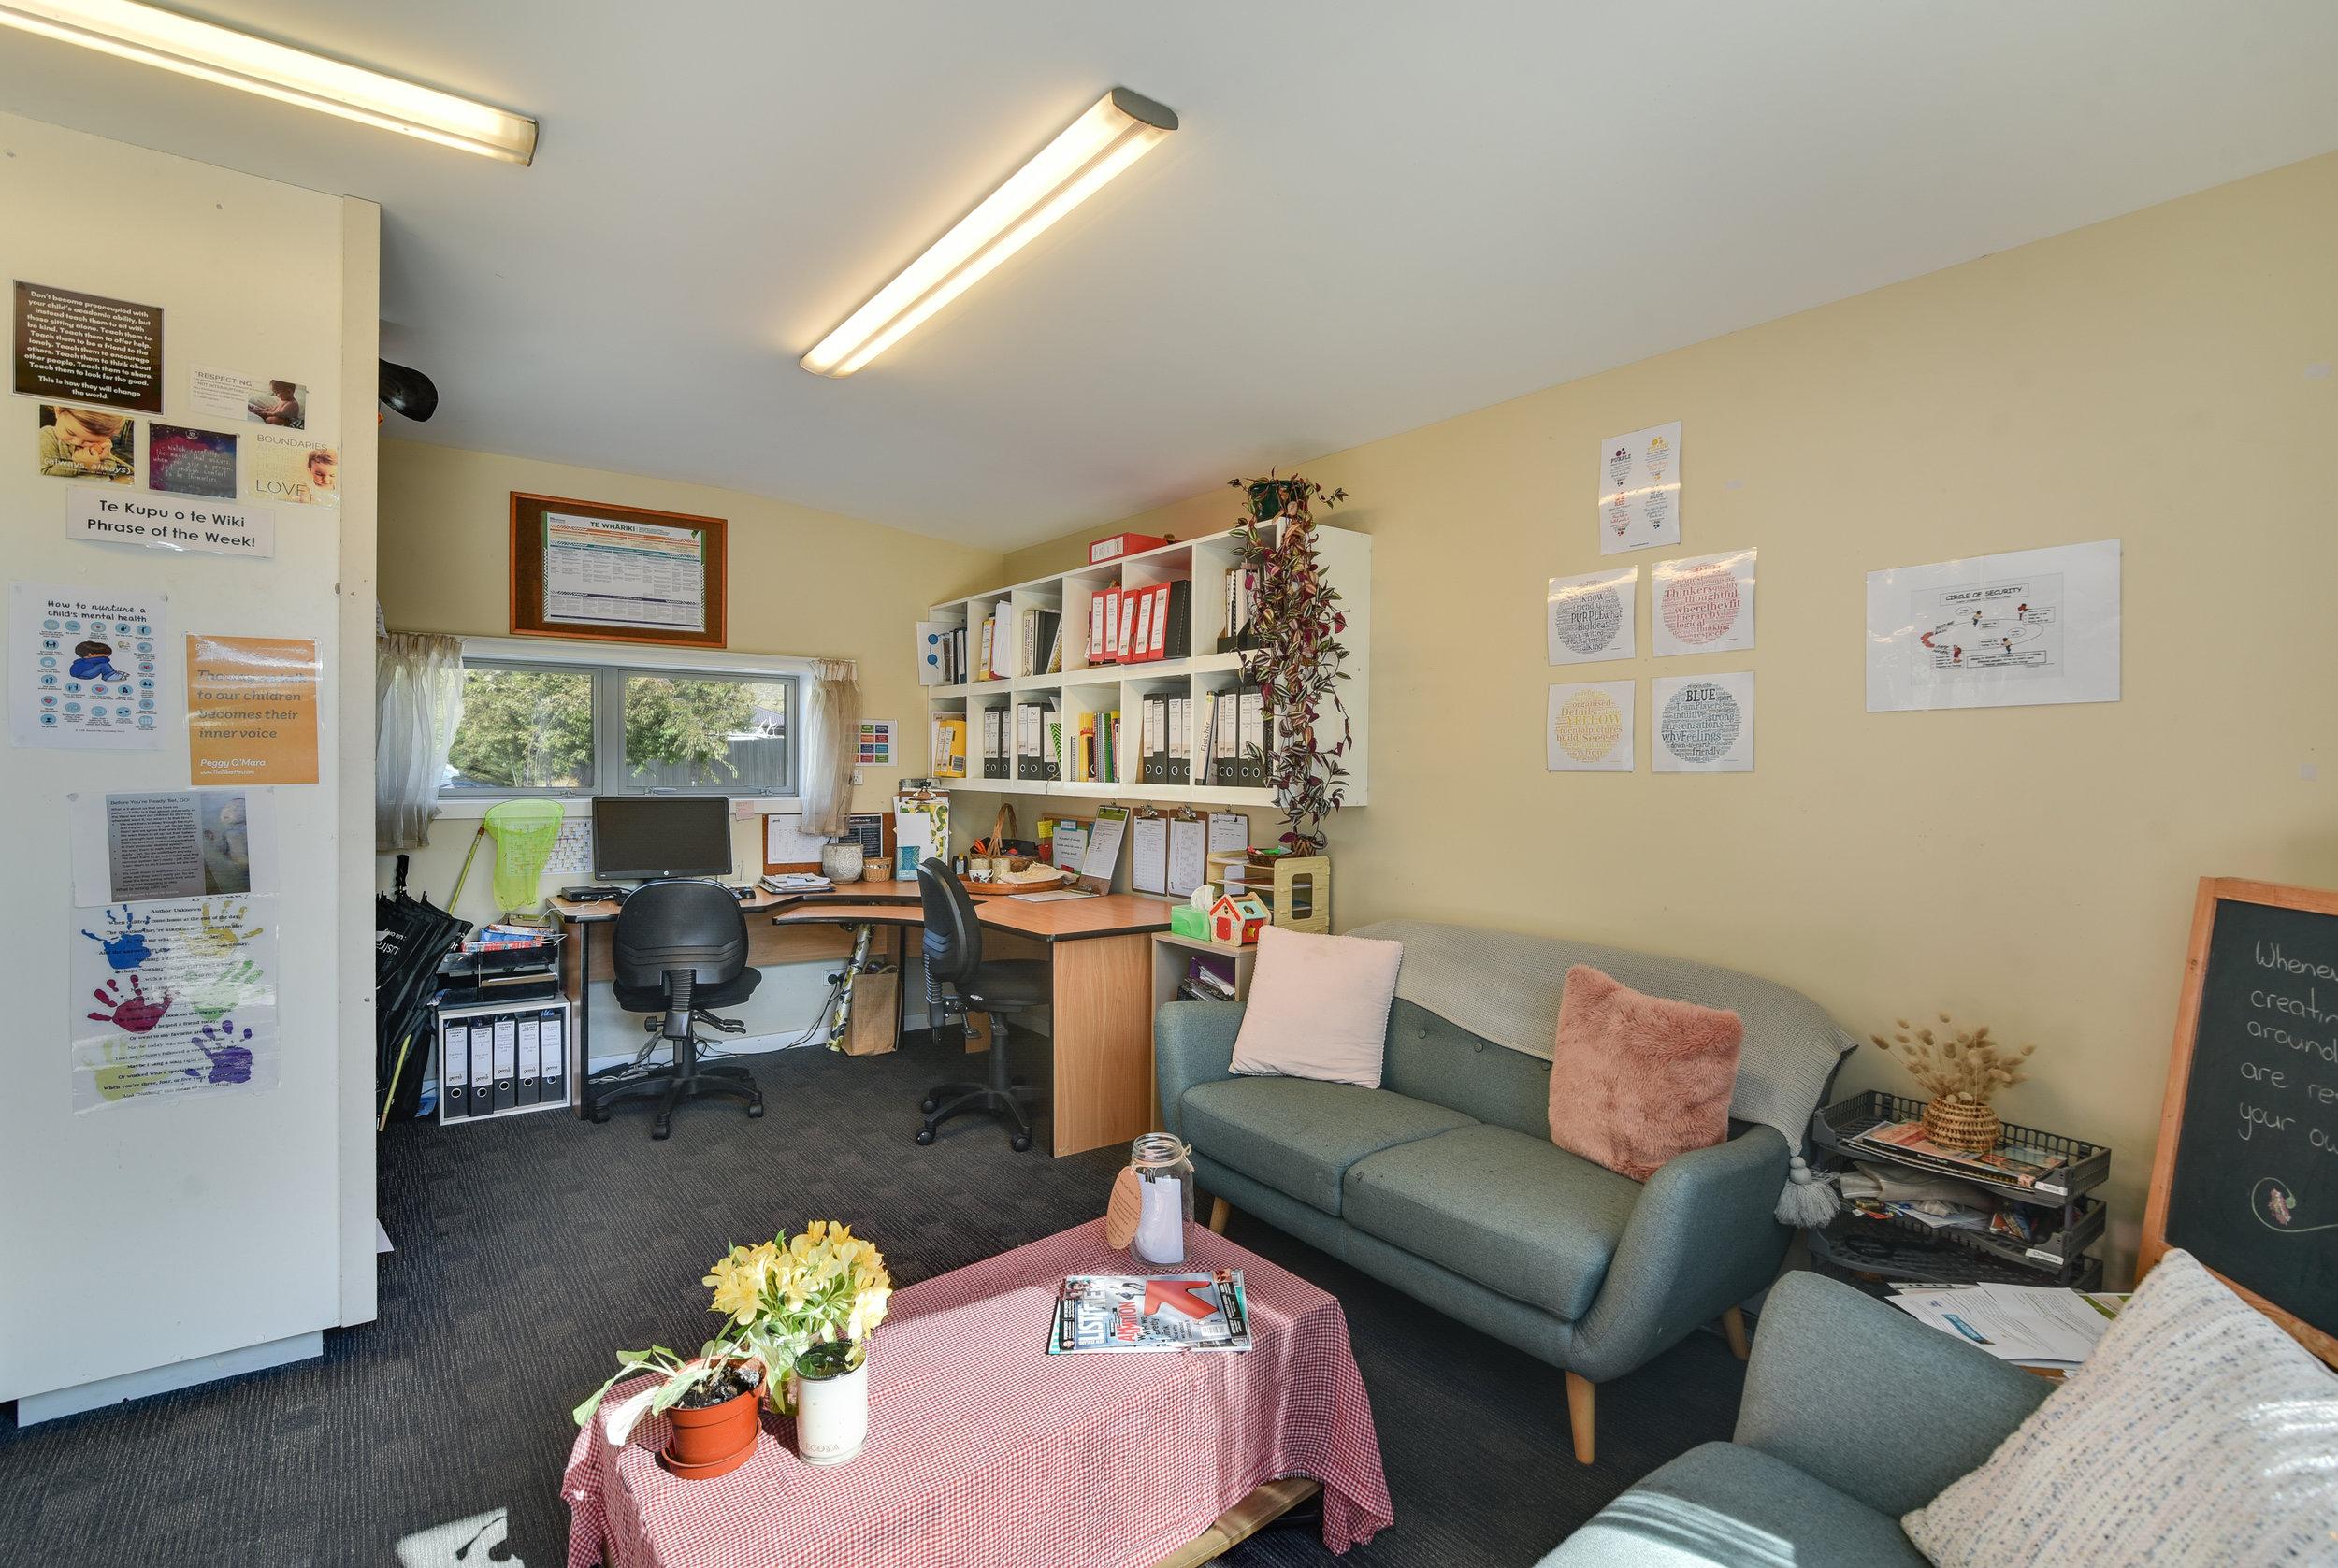 Gems Childcare interiors-2.jpg